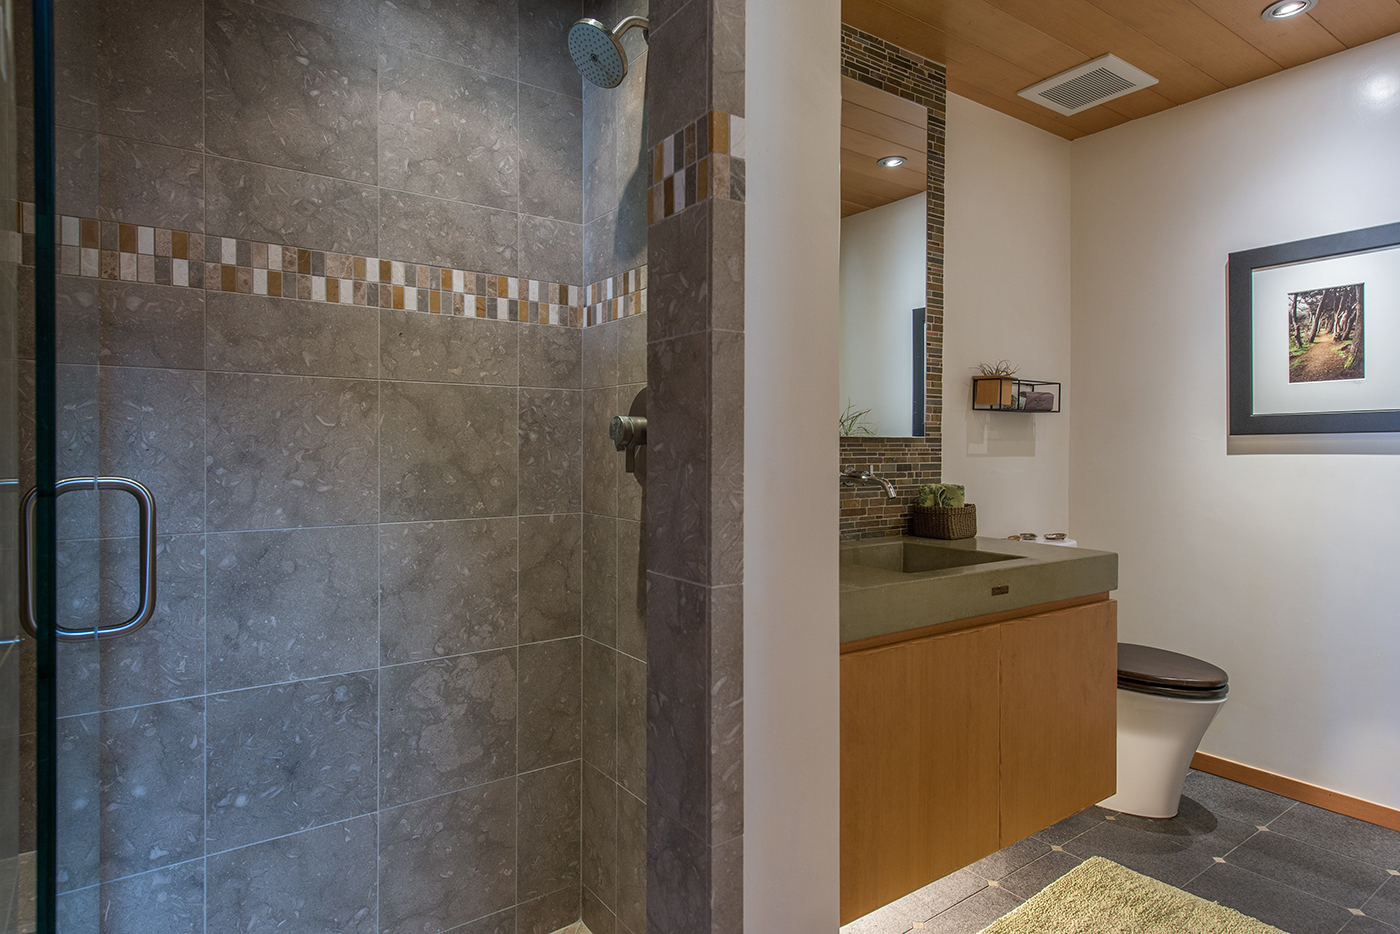 10-211-bathroom.jpg